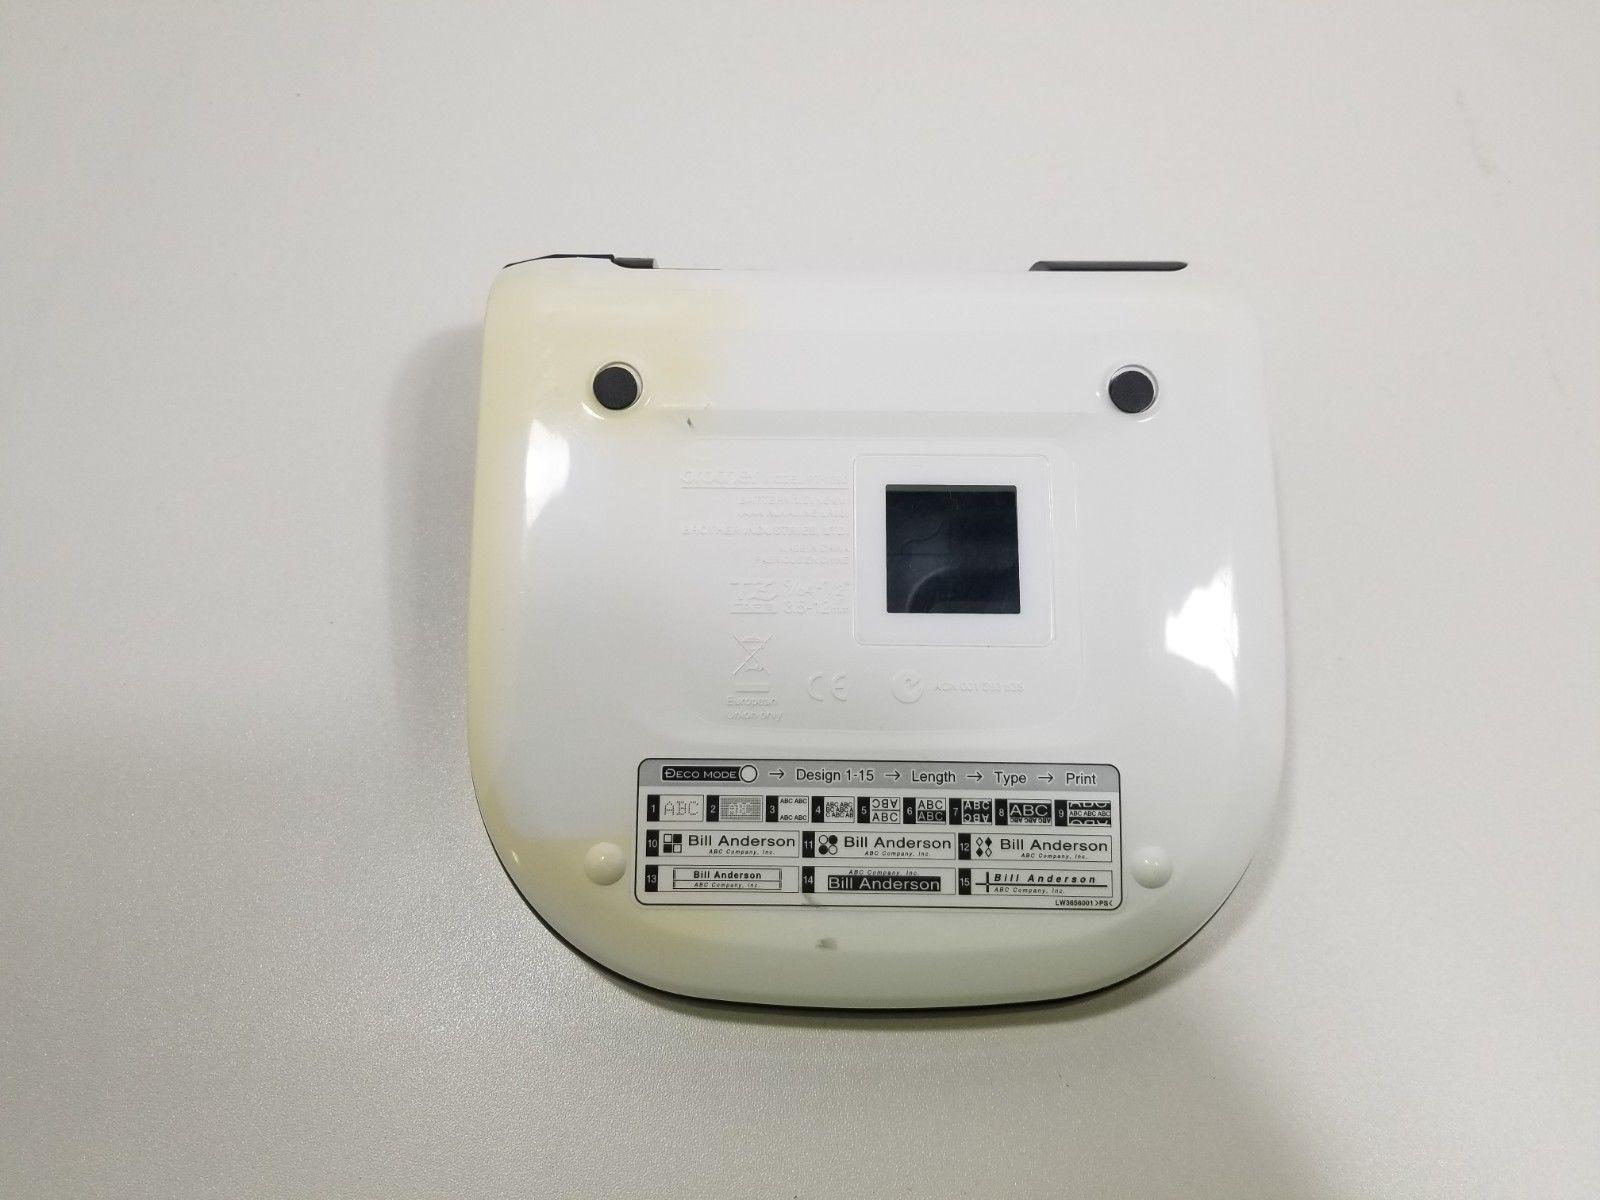 Brother PT-1290 Label Thermal Printer image 3